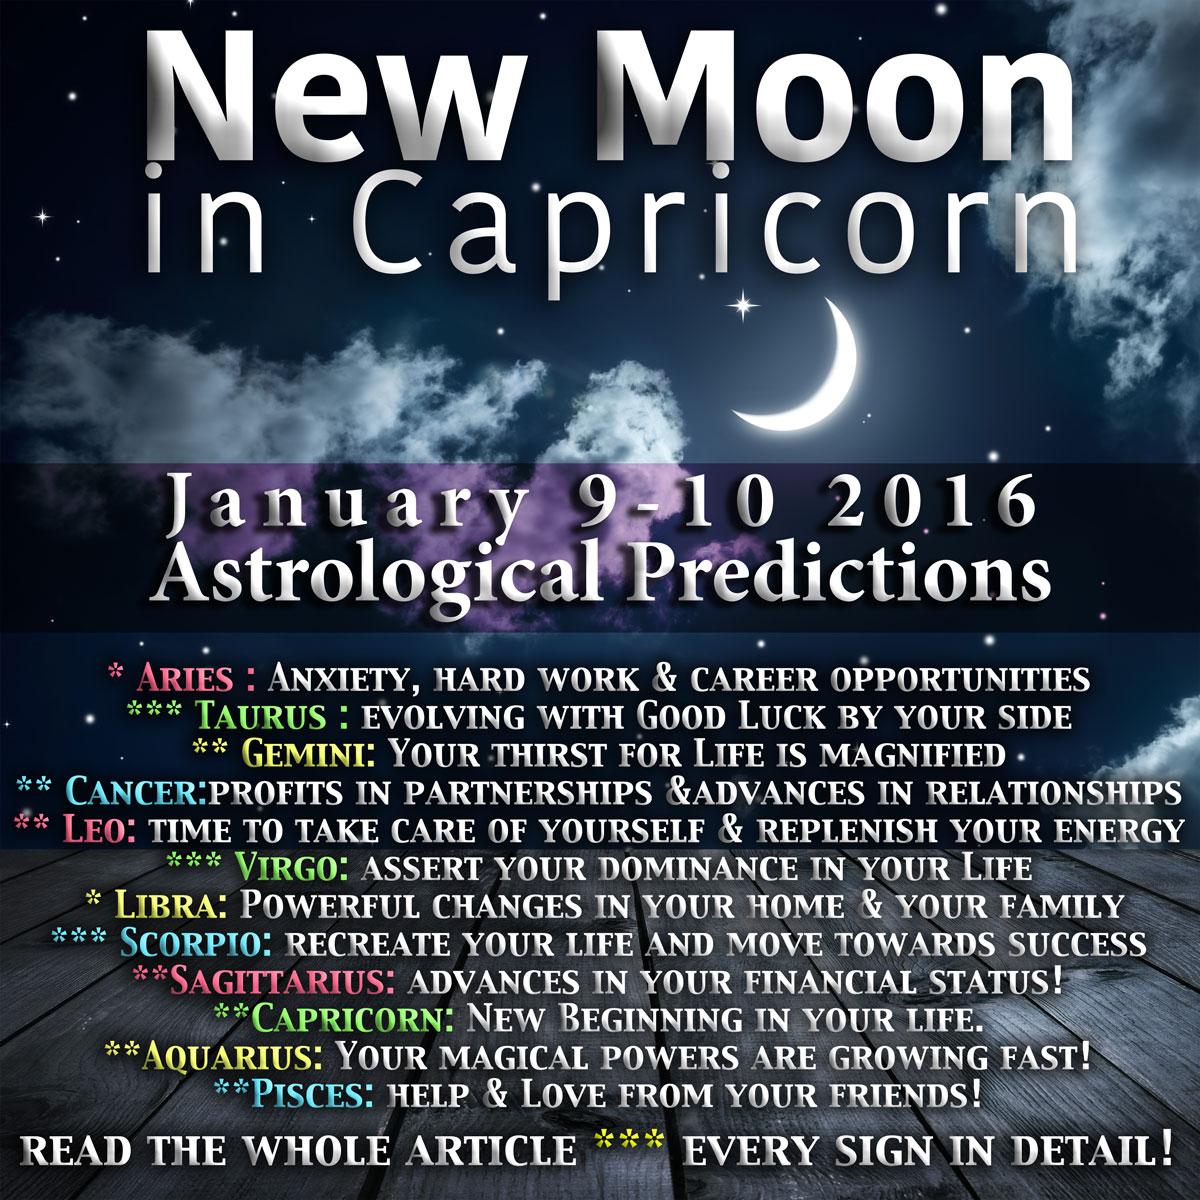 New Moon on 10 January 2016 Sunday - lunaf.com